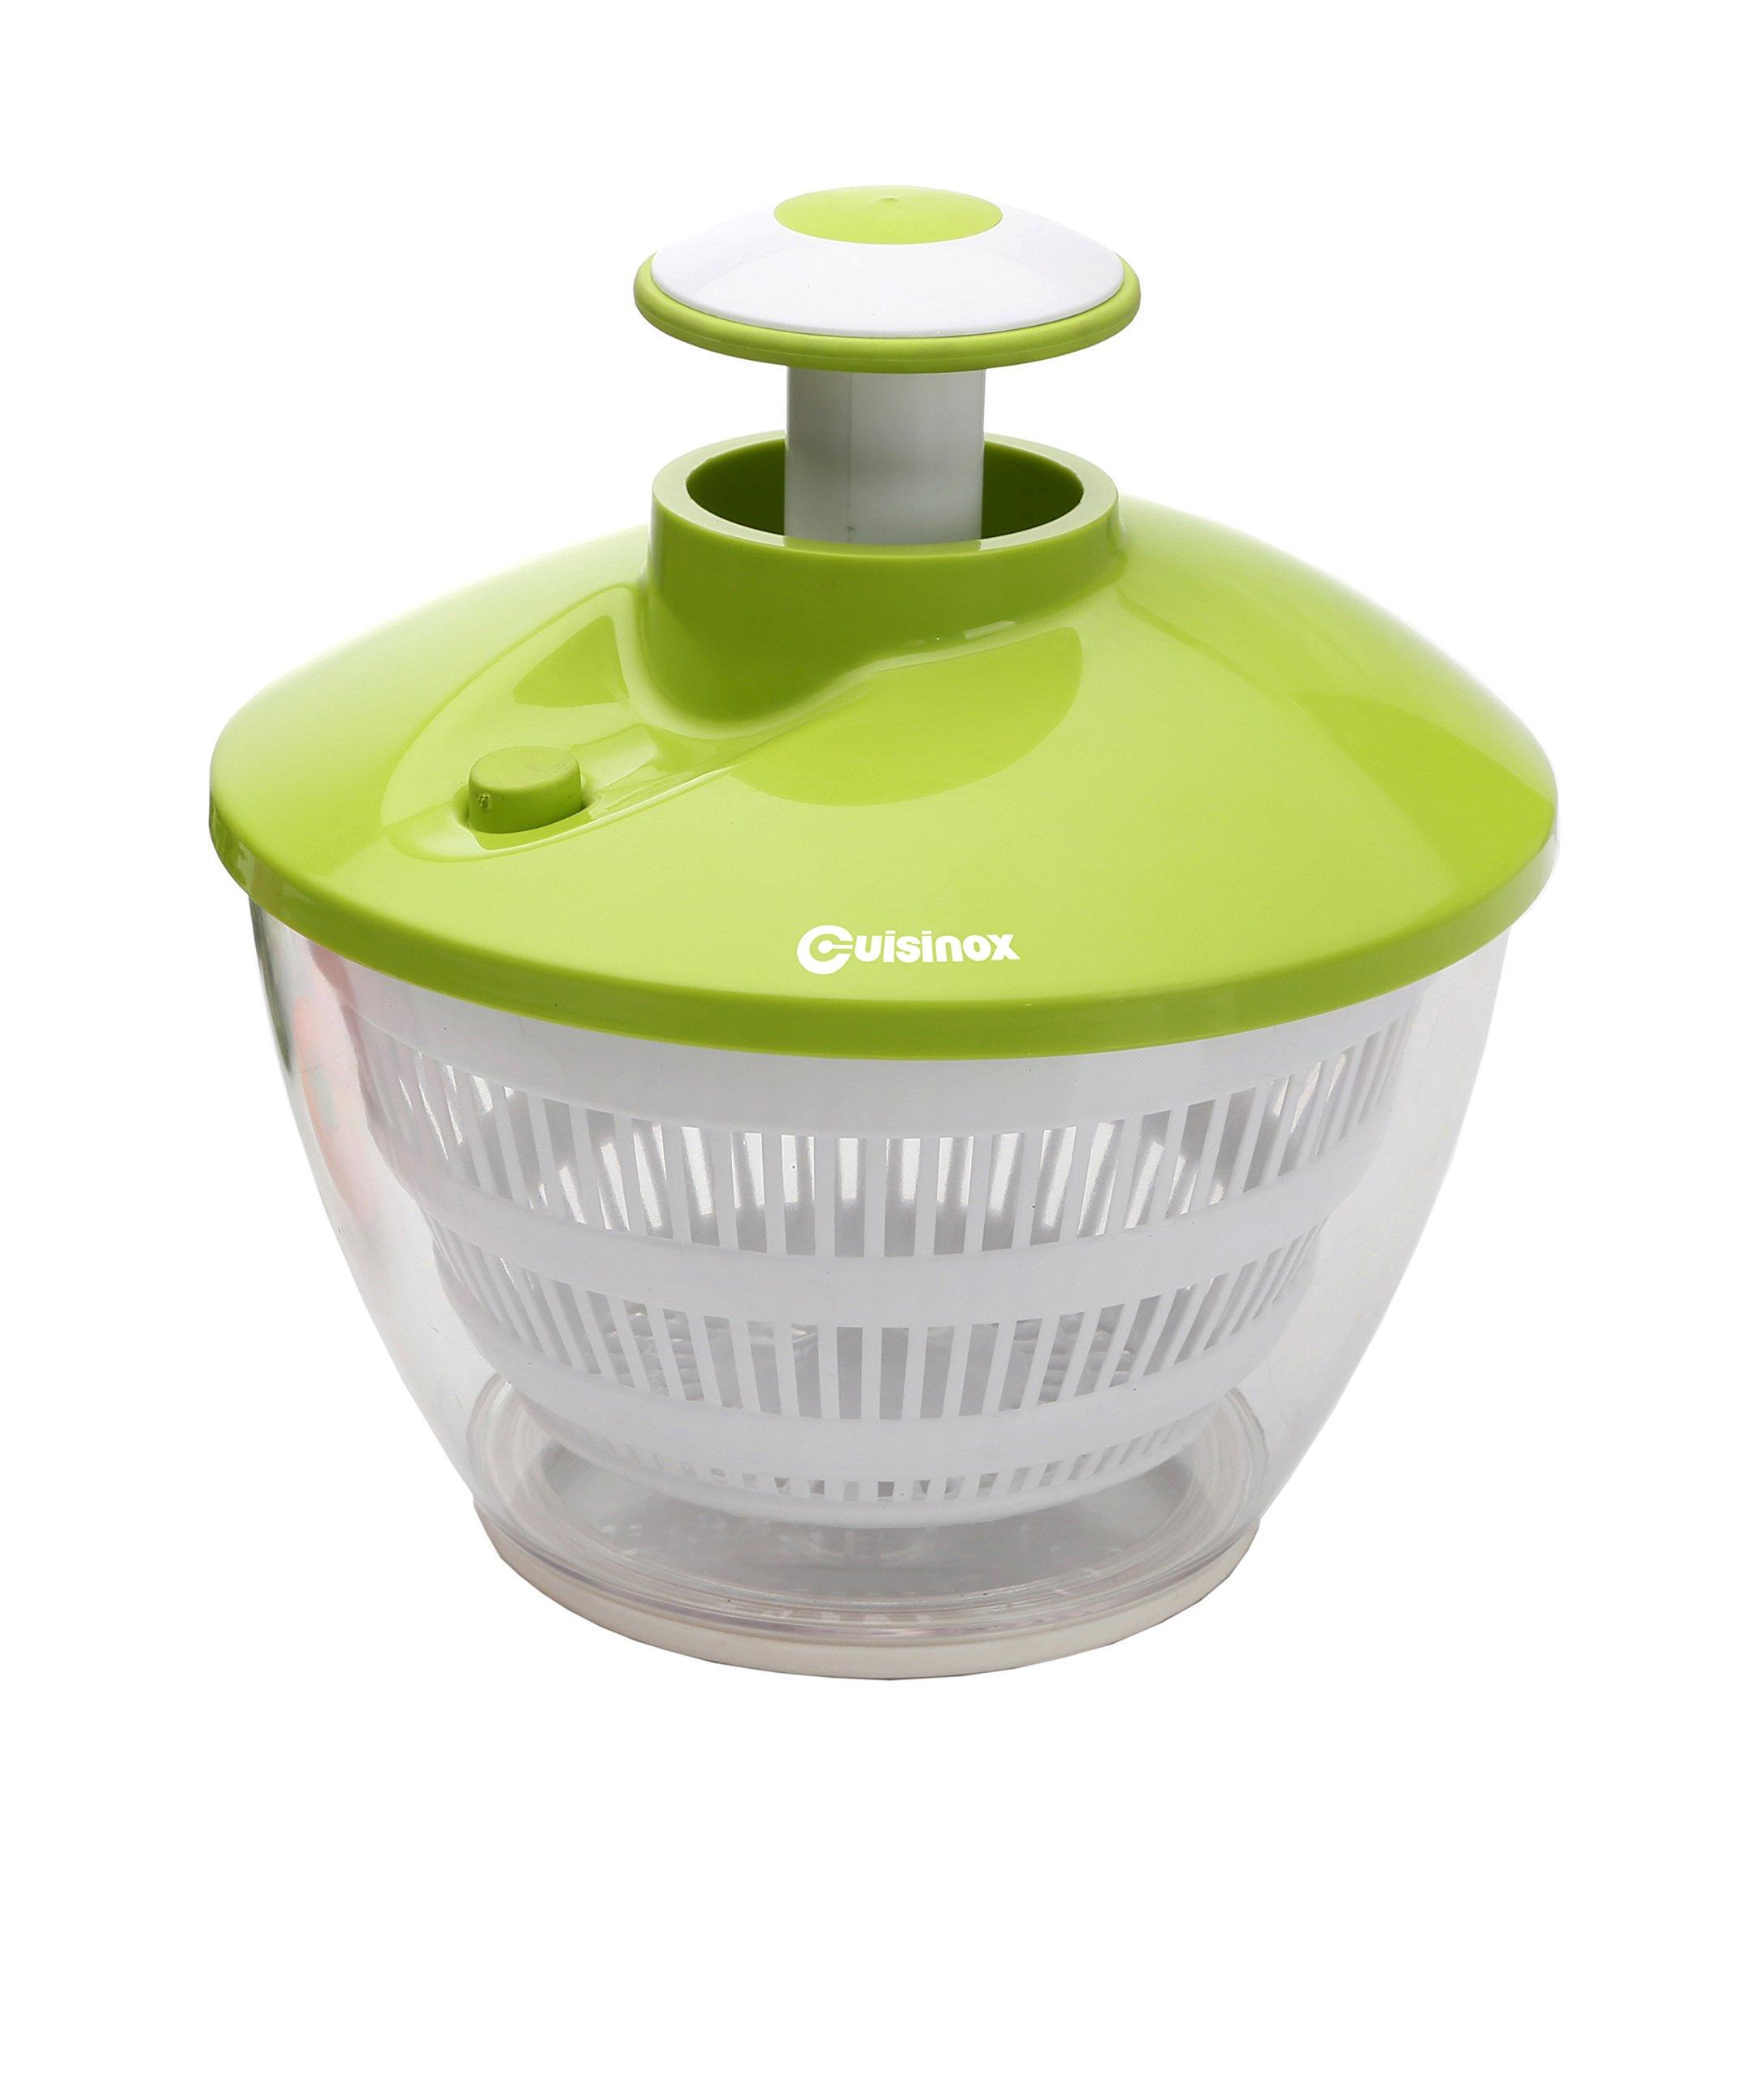 Cuisinox Pump Action Salad Spinner, Green by Cuisinox